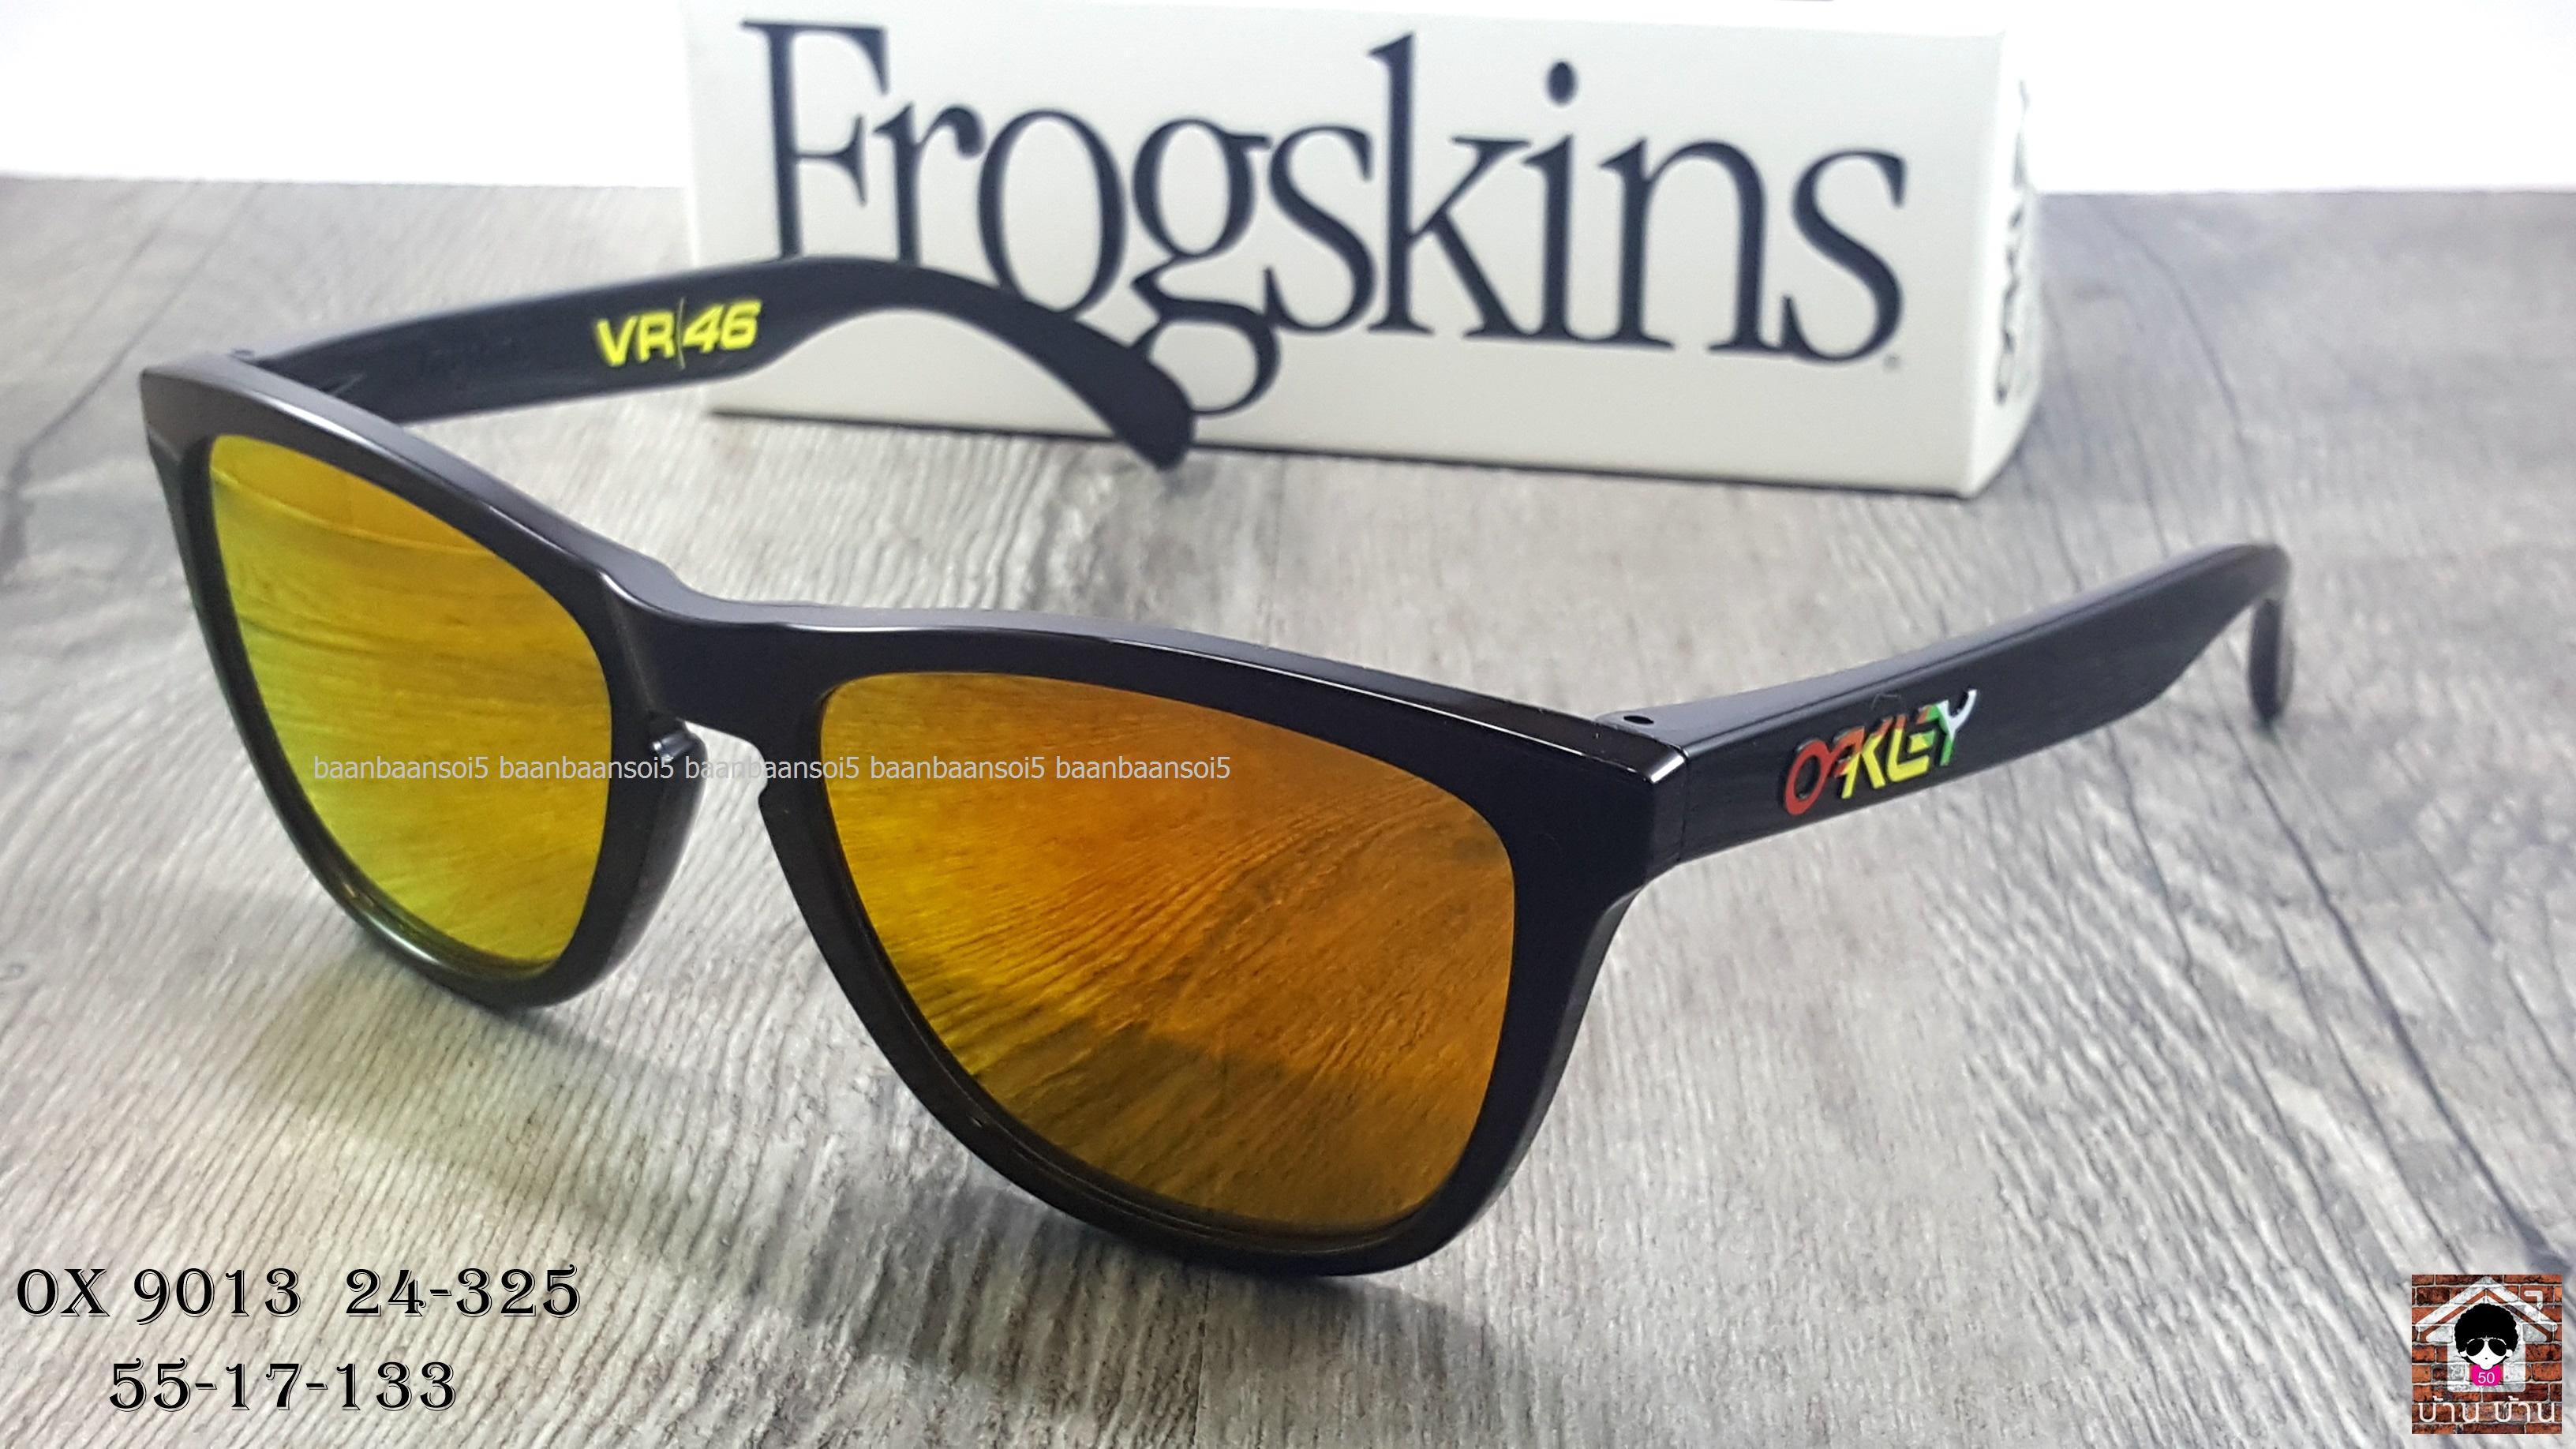 OAKLEY OO9013 24-325 FROGSKINS VR46 Collection โปรโมชั่น ราคา 3,890 บาท